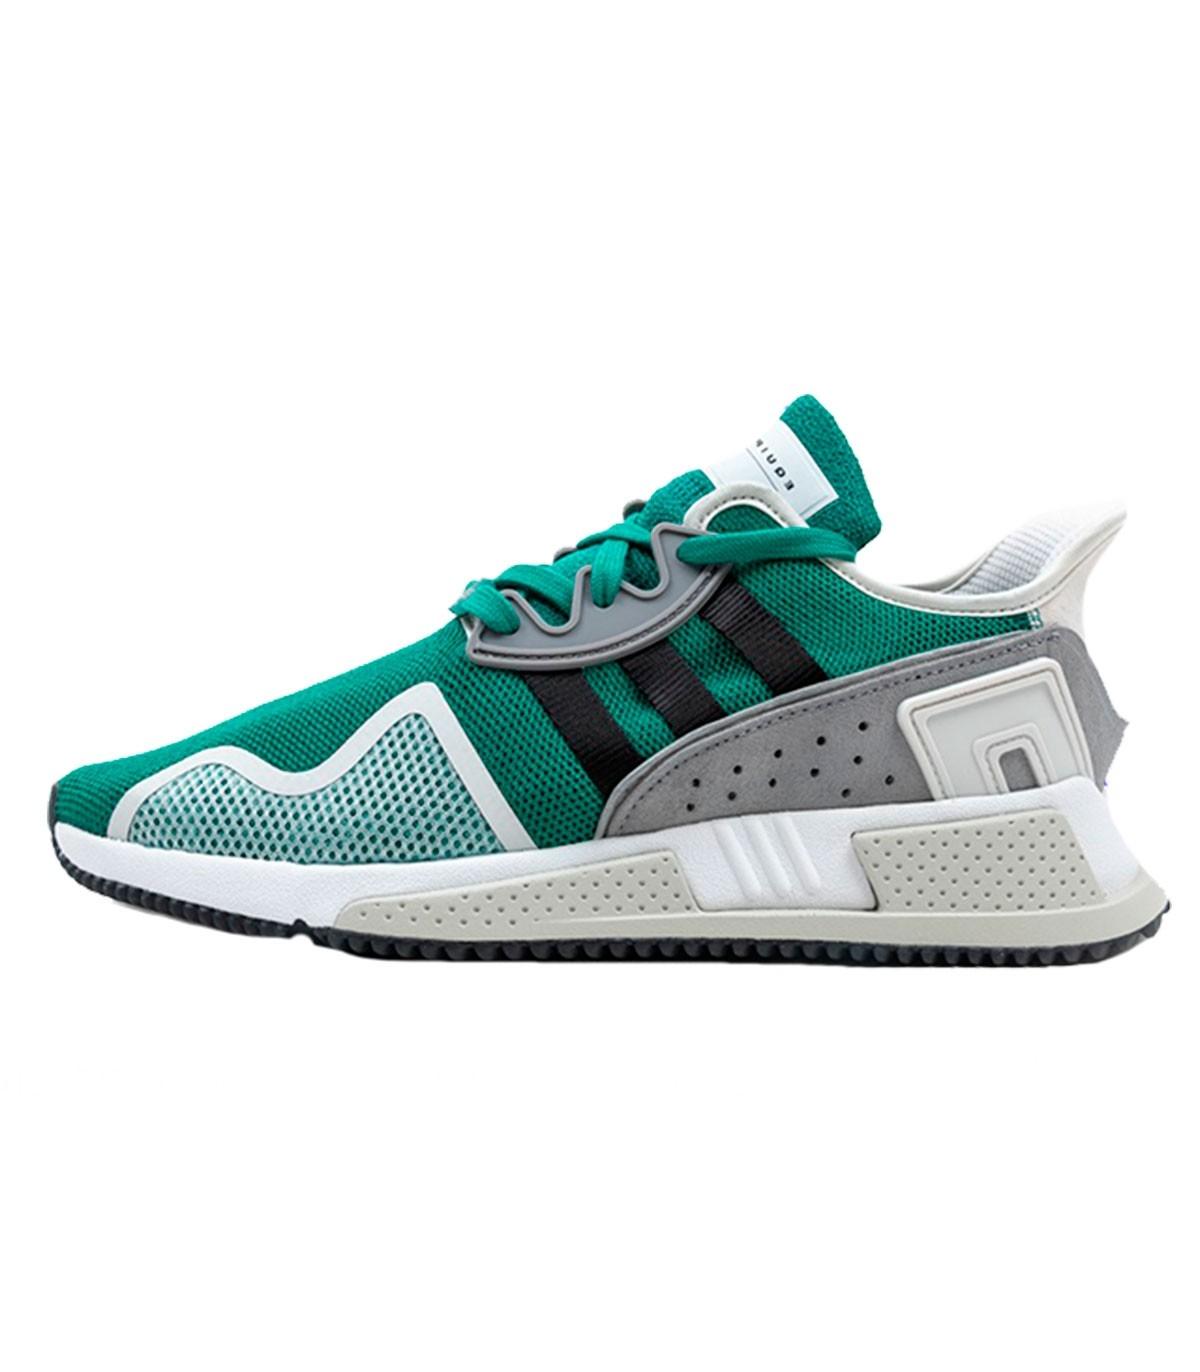 promo code f3dfc eb904 Adidas Eqt Cushion Adv